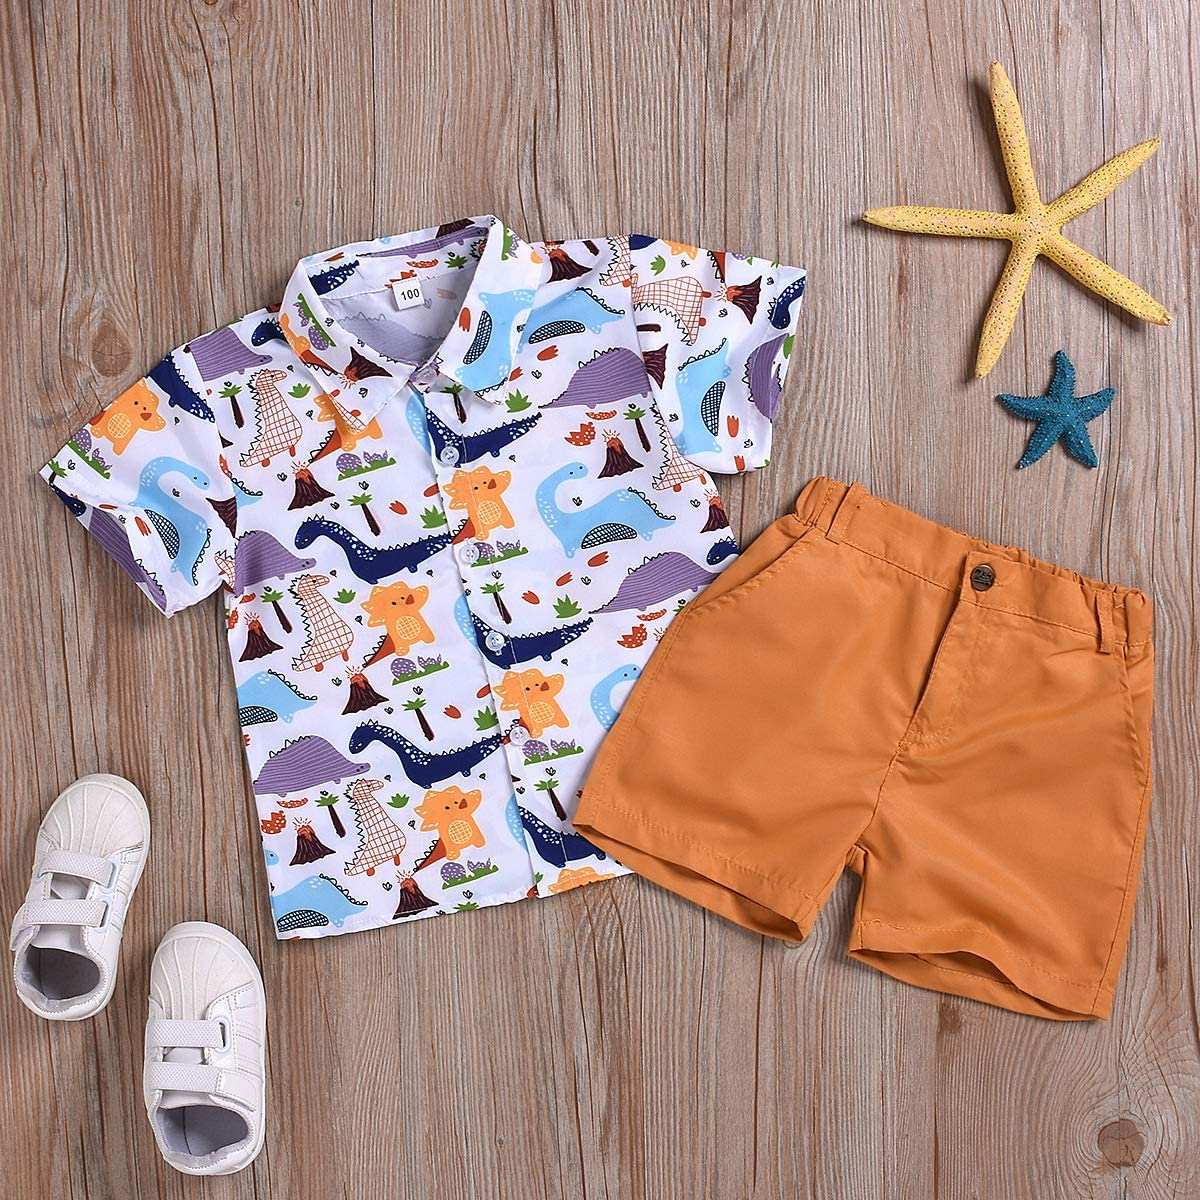 Dinosaurs Borlai Kid Boys Summer Clothes Suit Cute Cartoon Shirts 2pcs Animal Print Top Shirt Pants Shorts Boys Fashion Outfits Birthday Gift